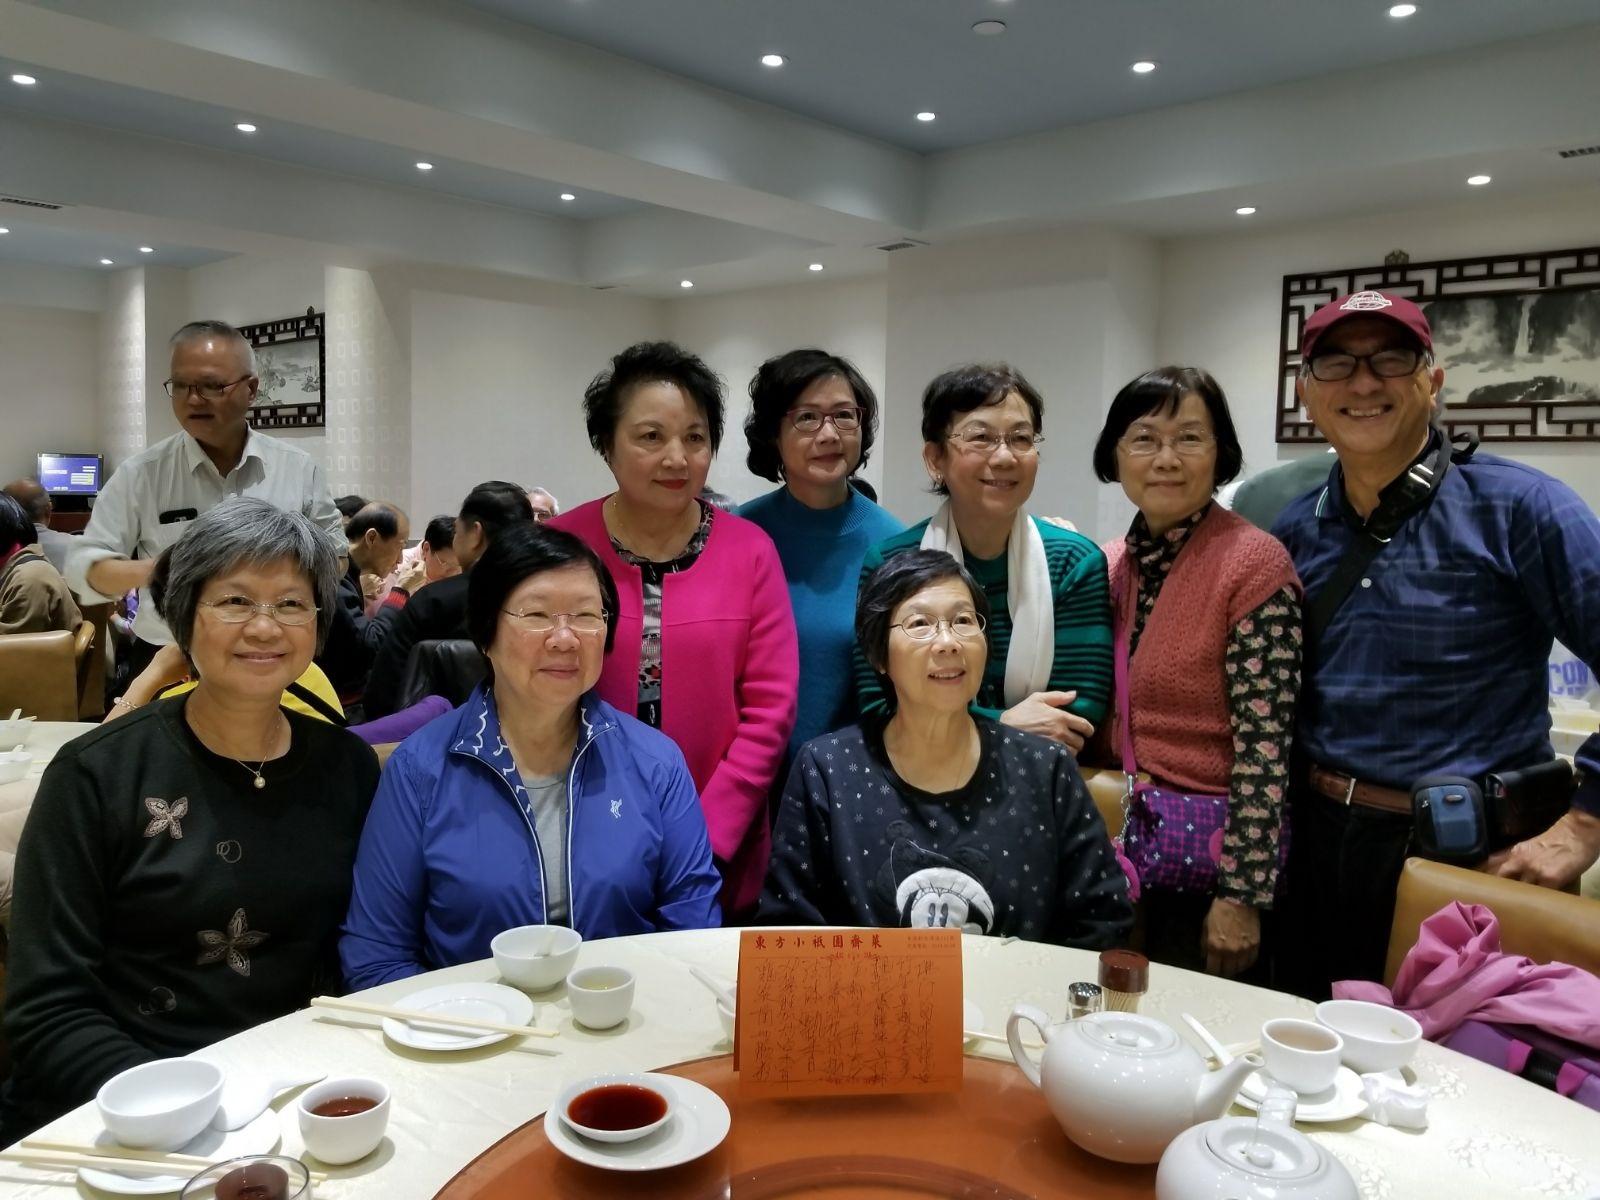 2017 December 11 2017 Group Photo in Hong Kong